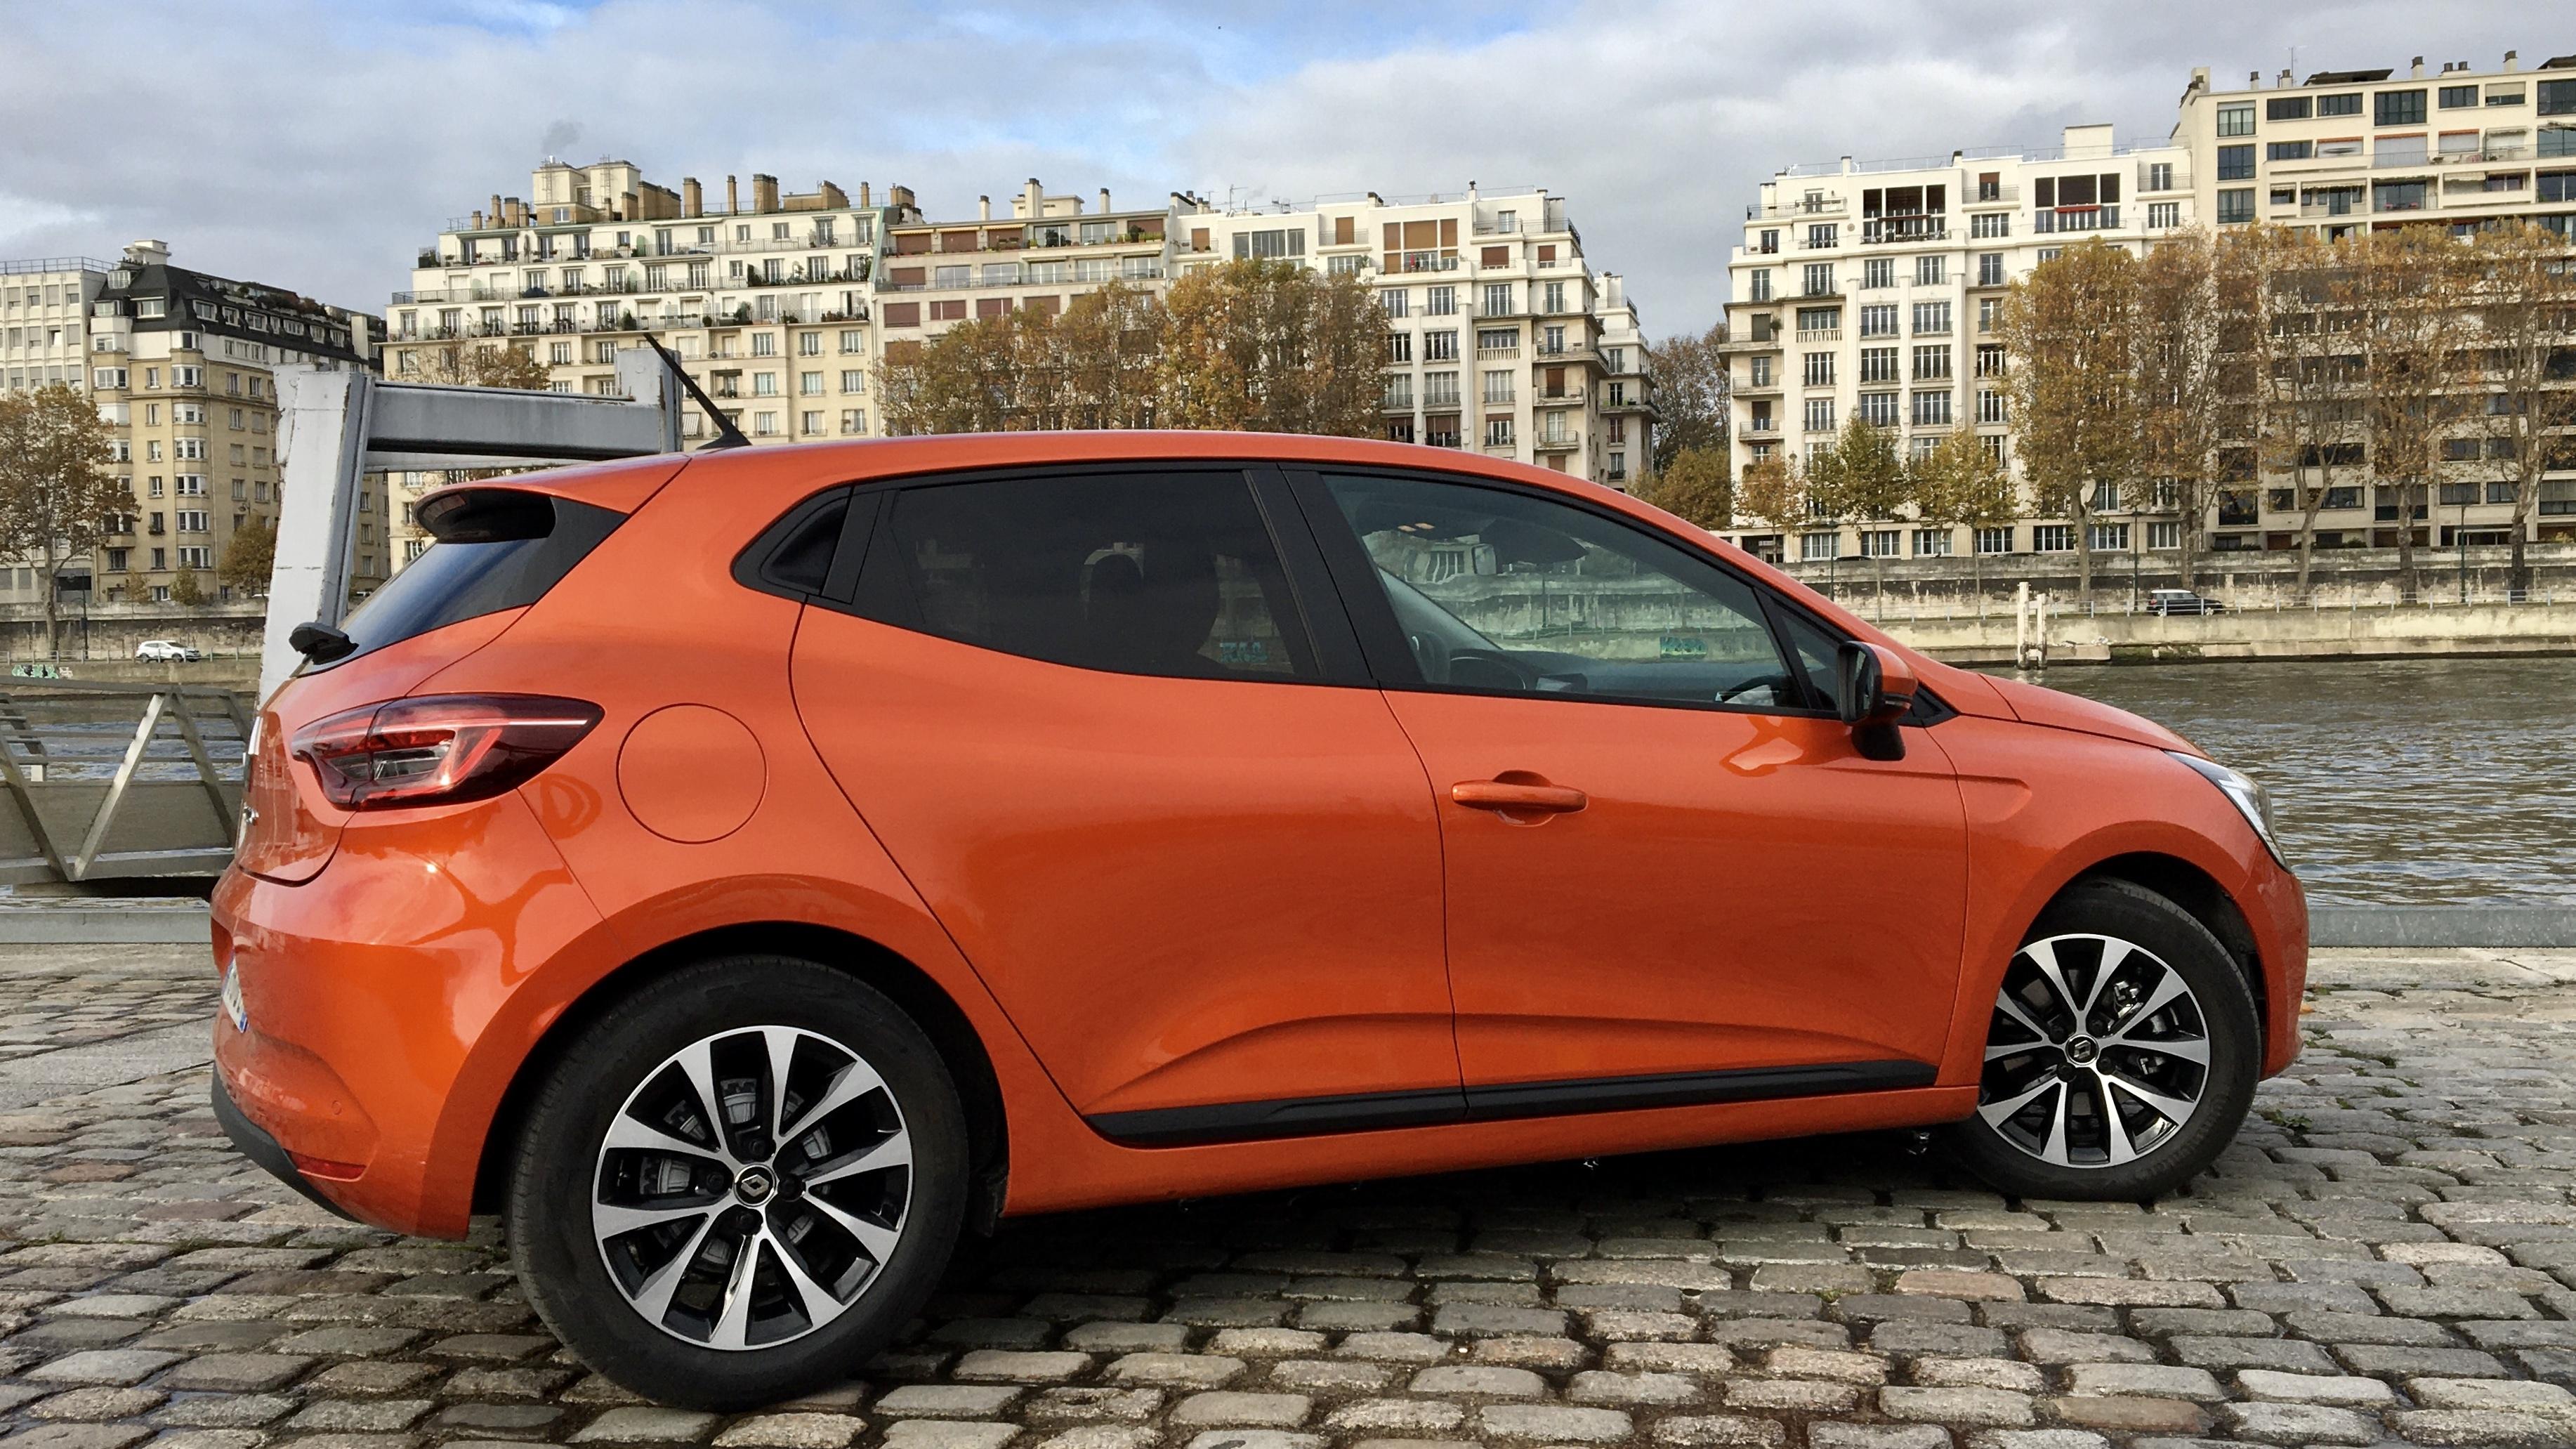 2019 - [Renault] Clio V (BJA) - Page 17 S0-essai-renault-clio-dci-85-611039